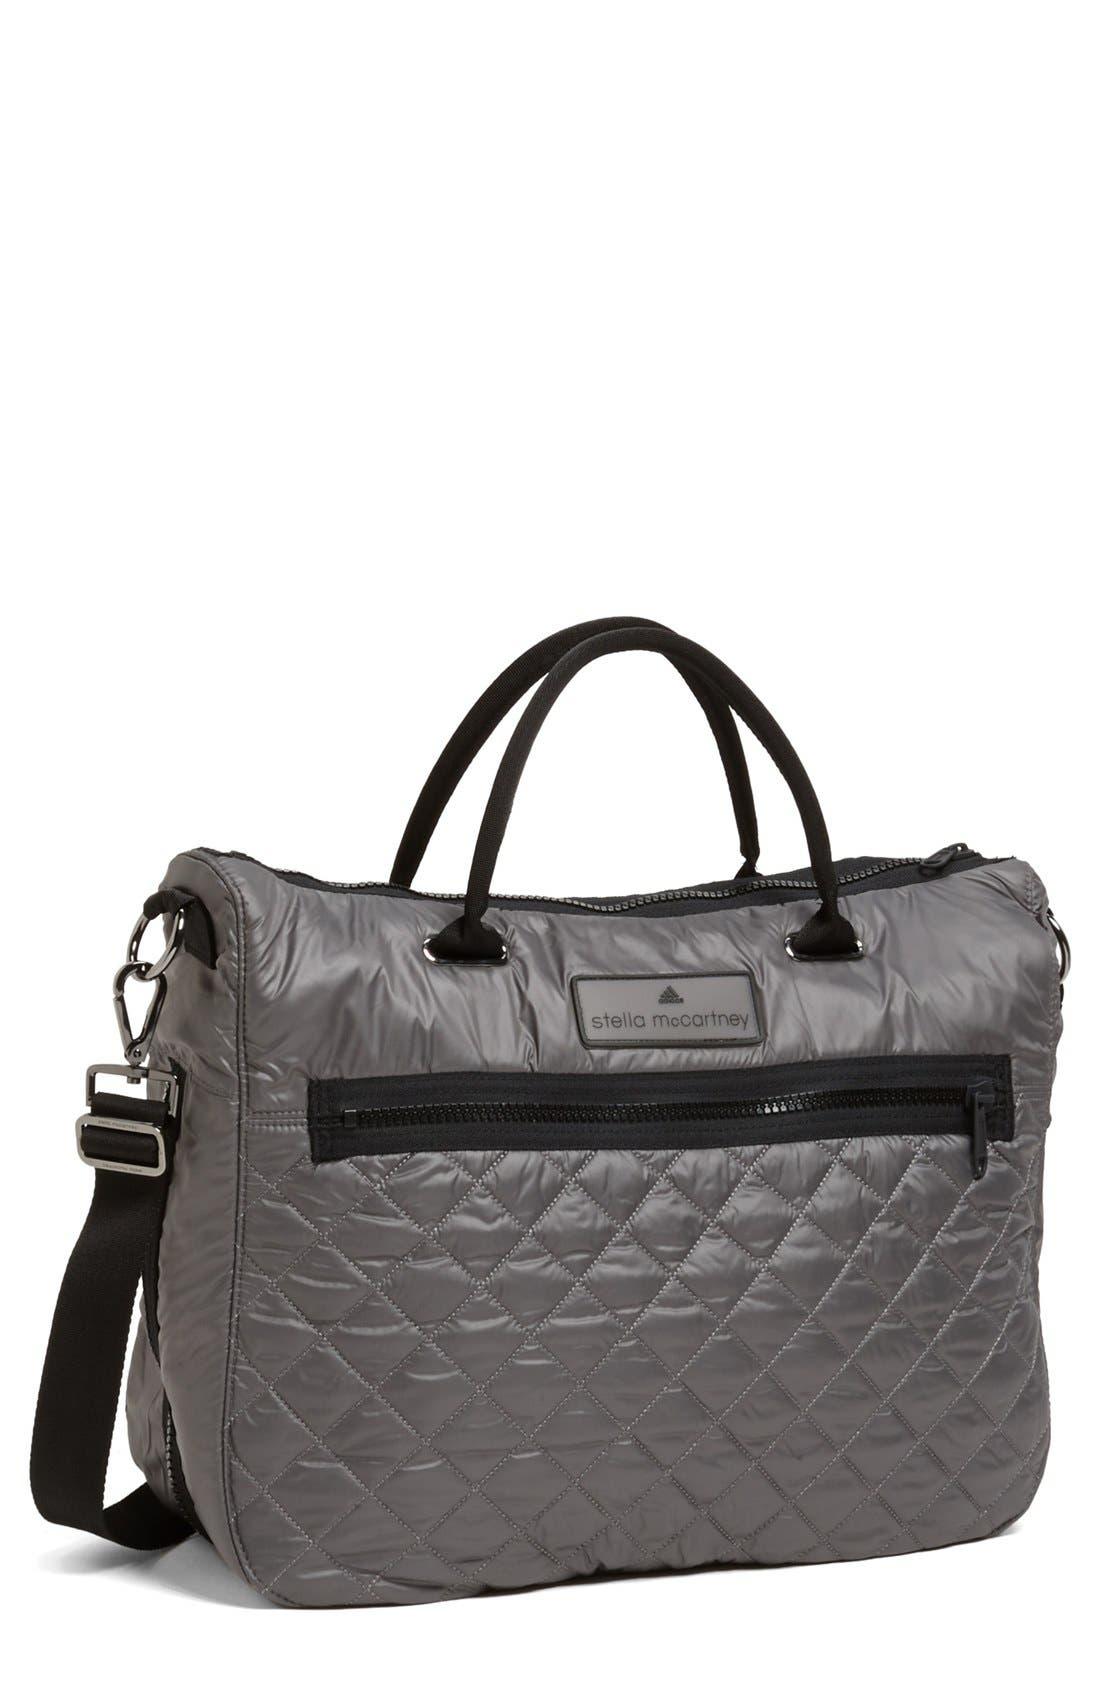 Main Image - adidas by Stella McCartney 'Fashion' Bag